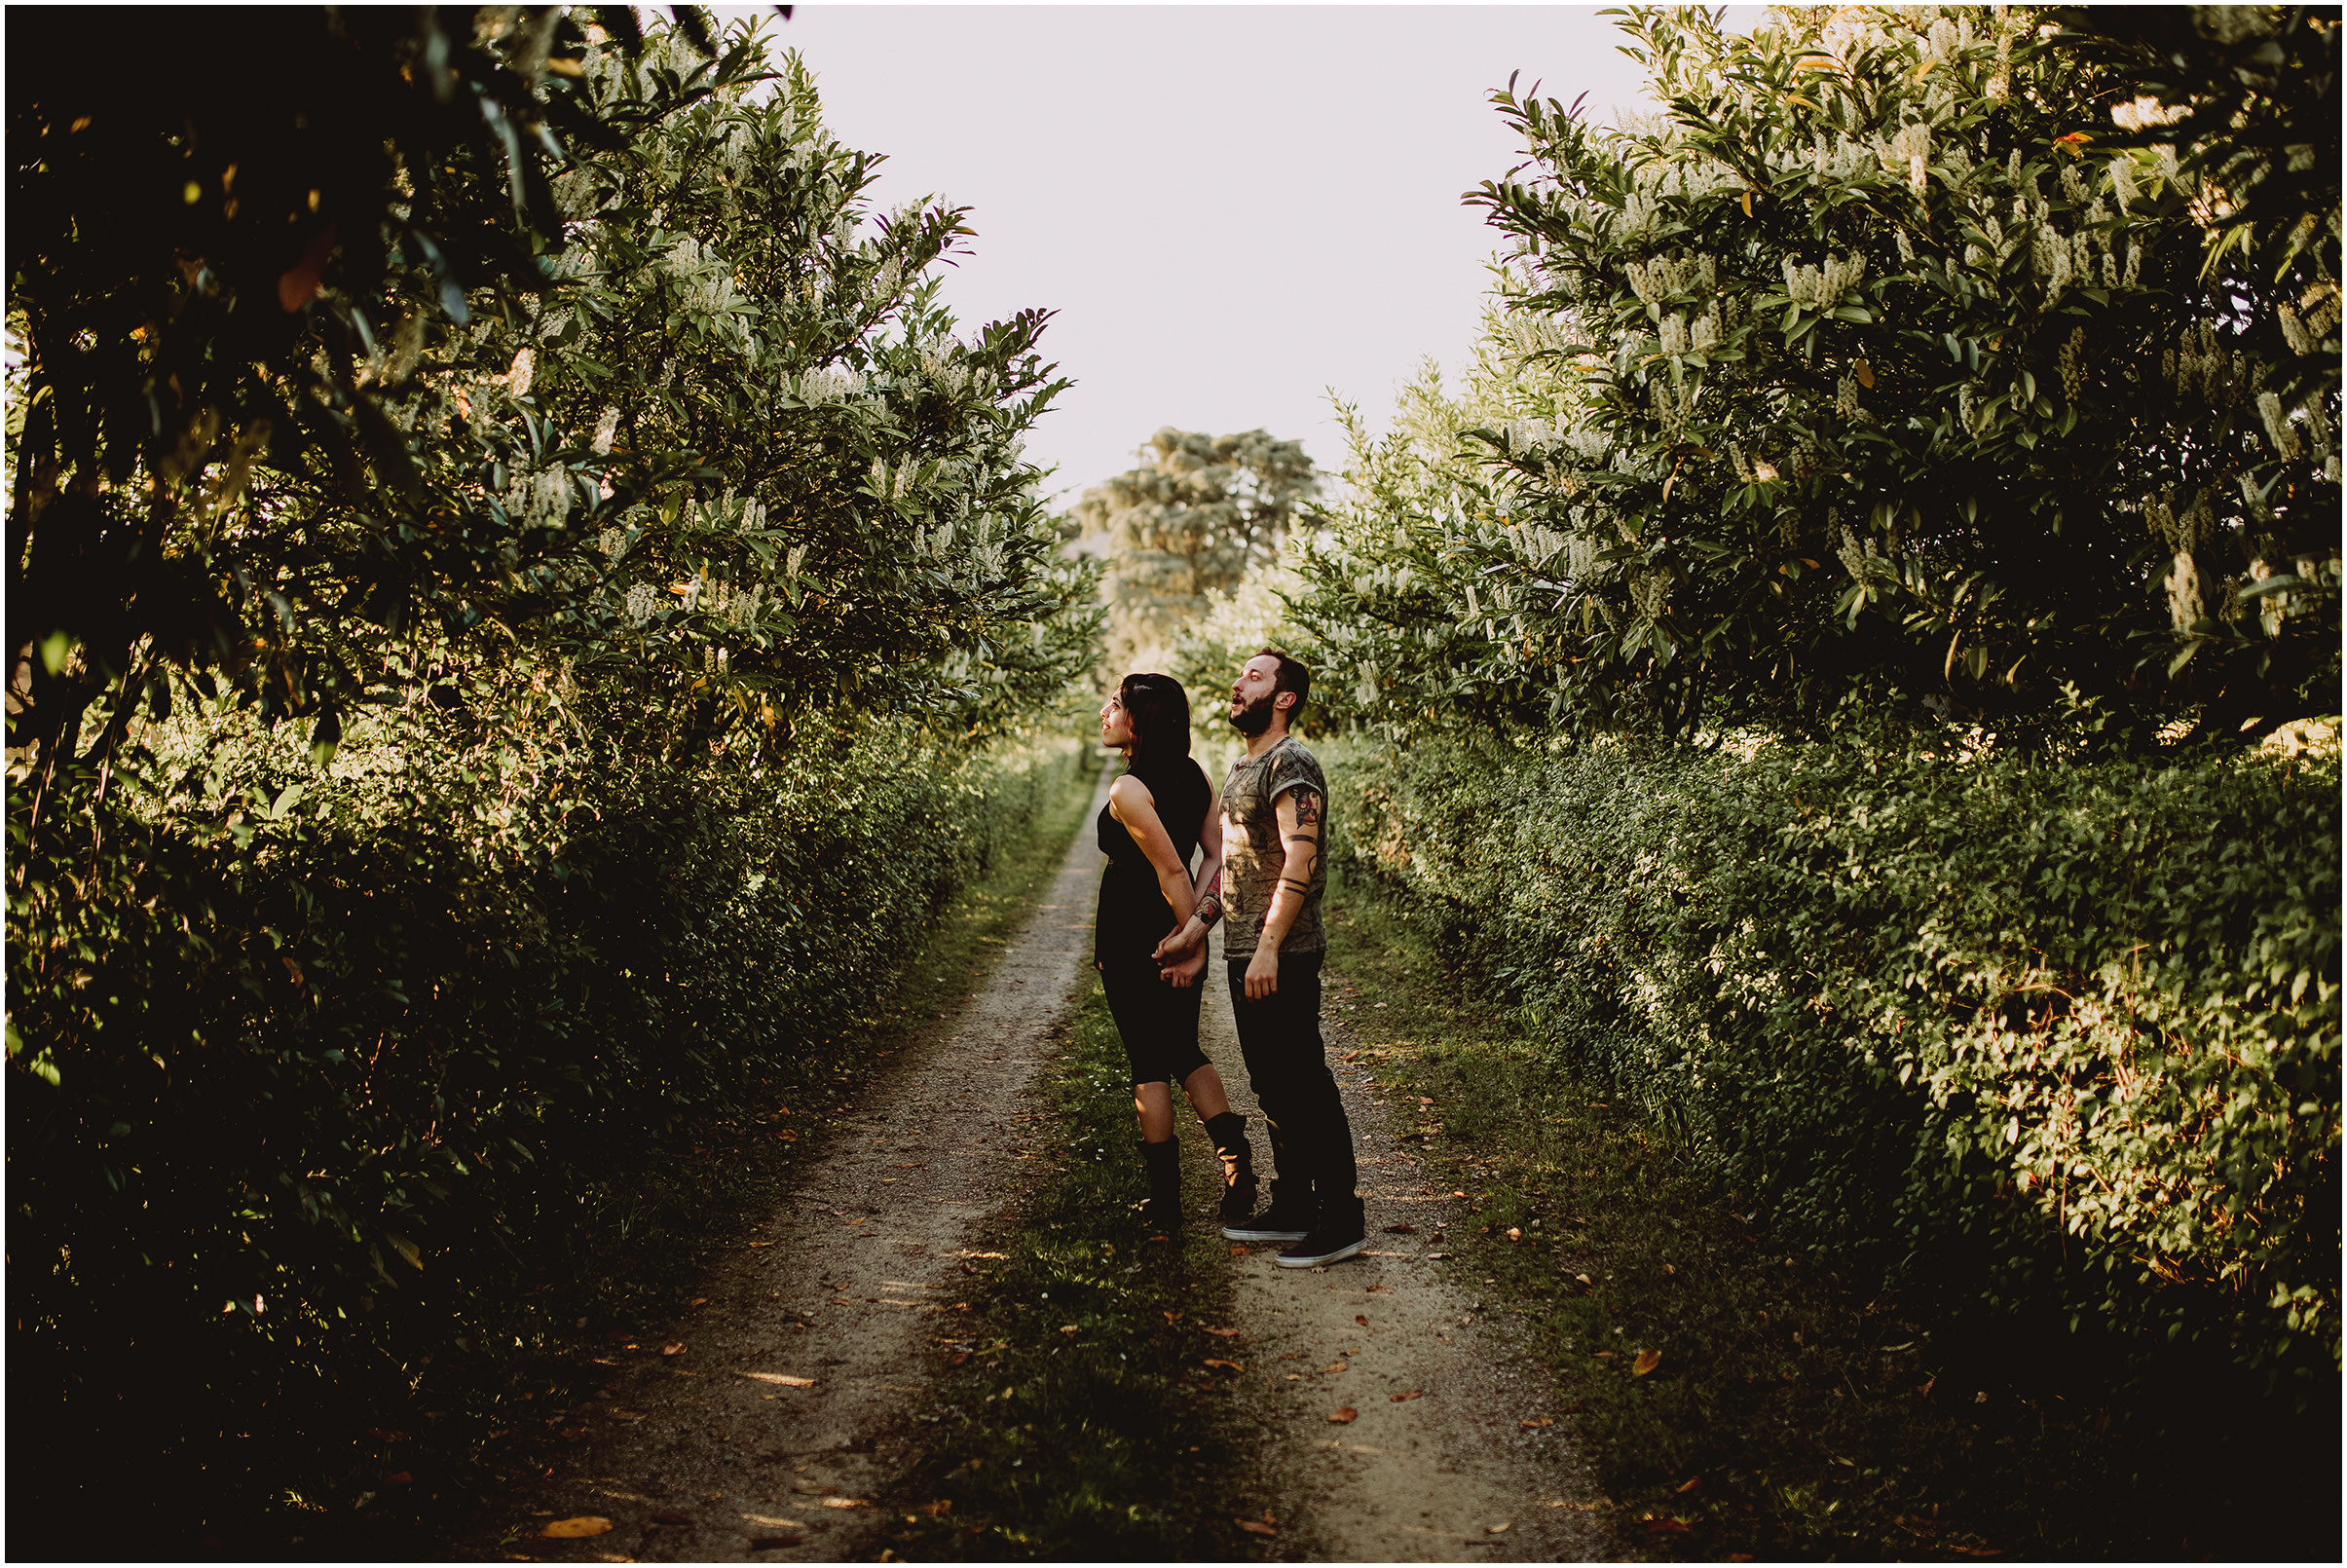 coppia-lovesession-marta-nicola-sara-lorenzoni-fotografia-wedding-matrimonio-arezzo-04